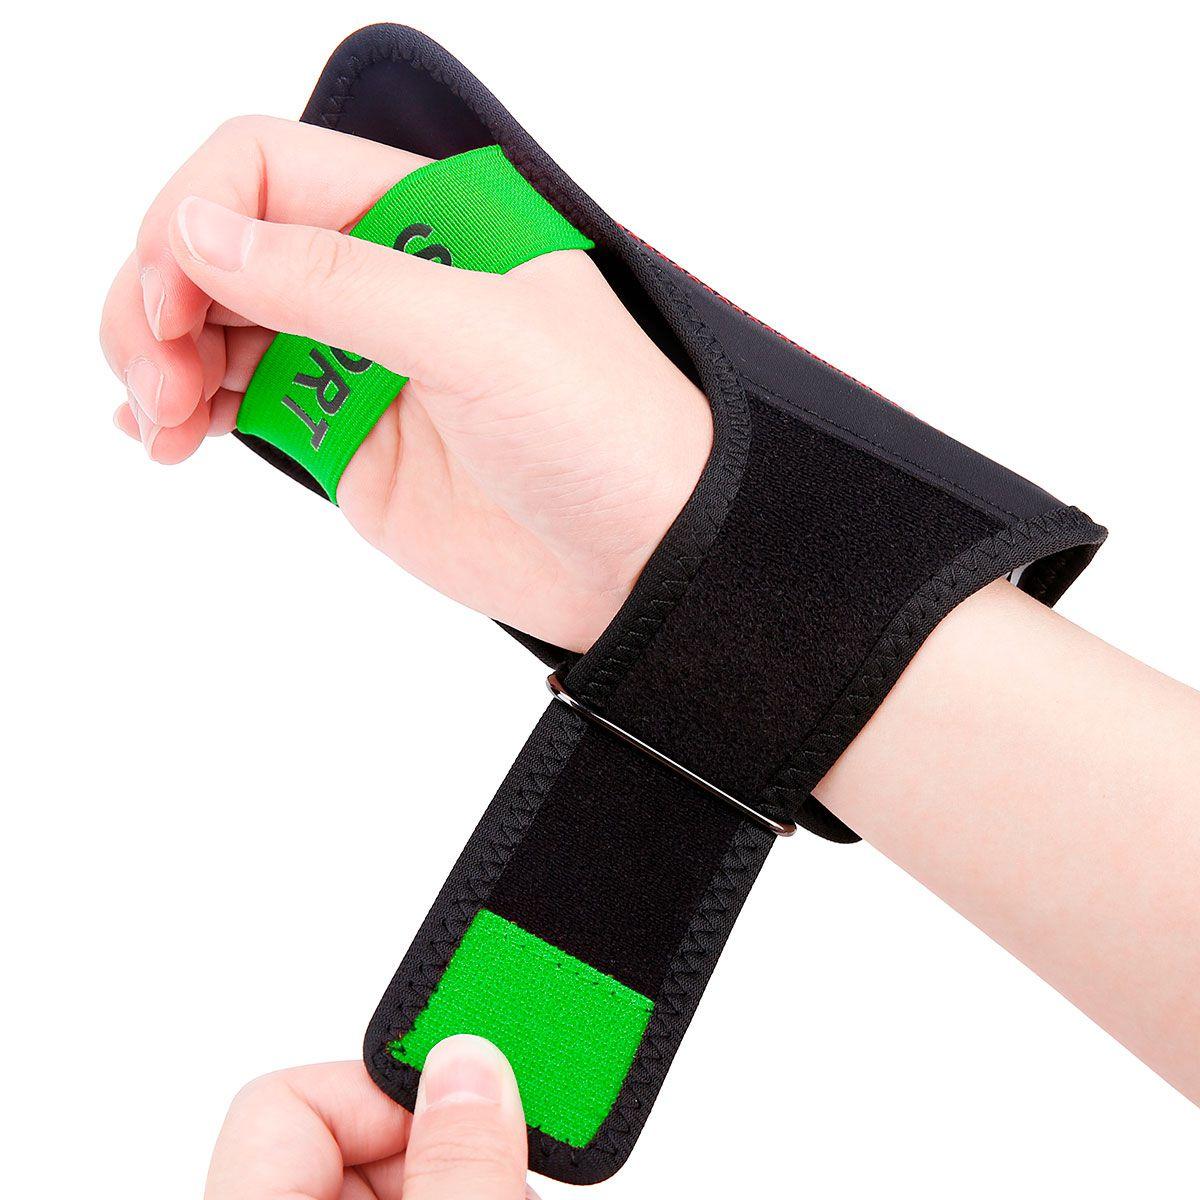 Capa Impermeável Armband Baseus para Pulso